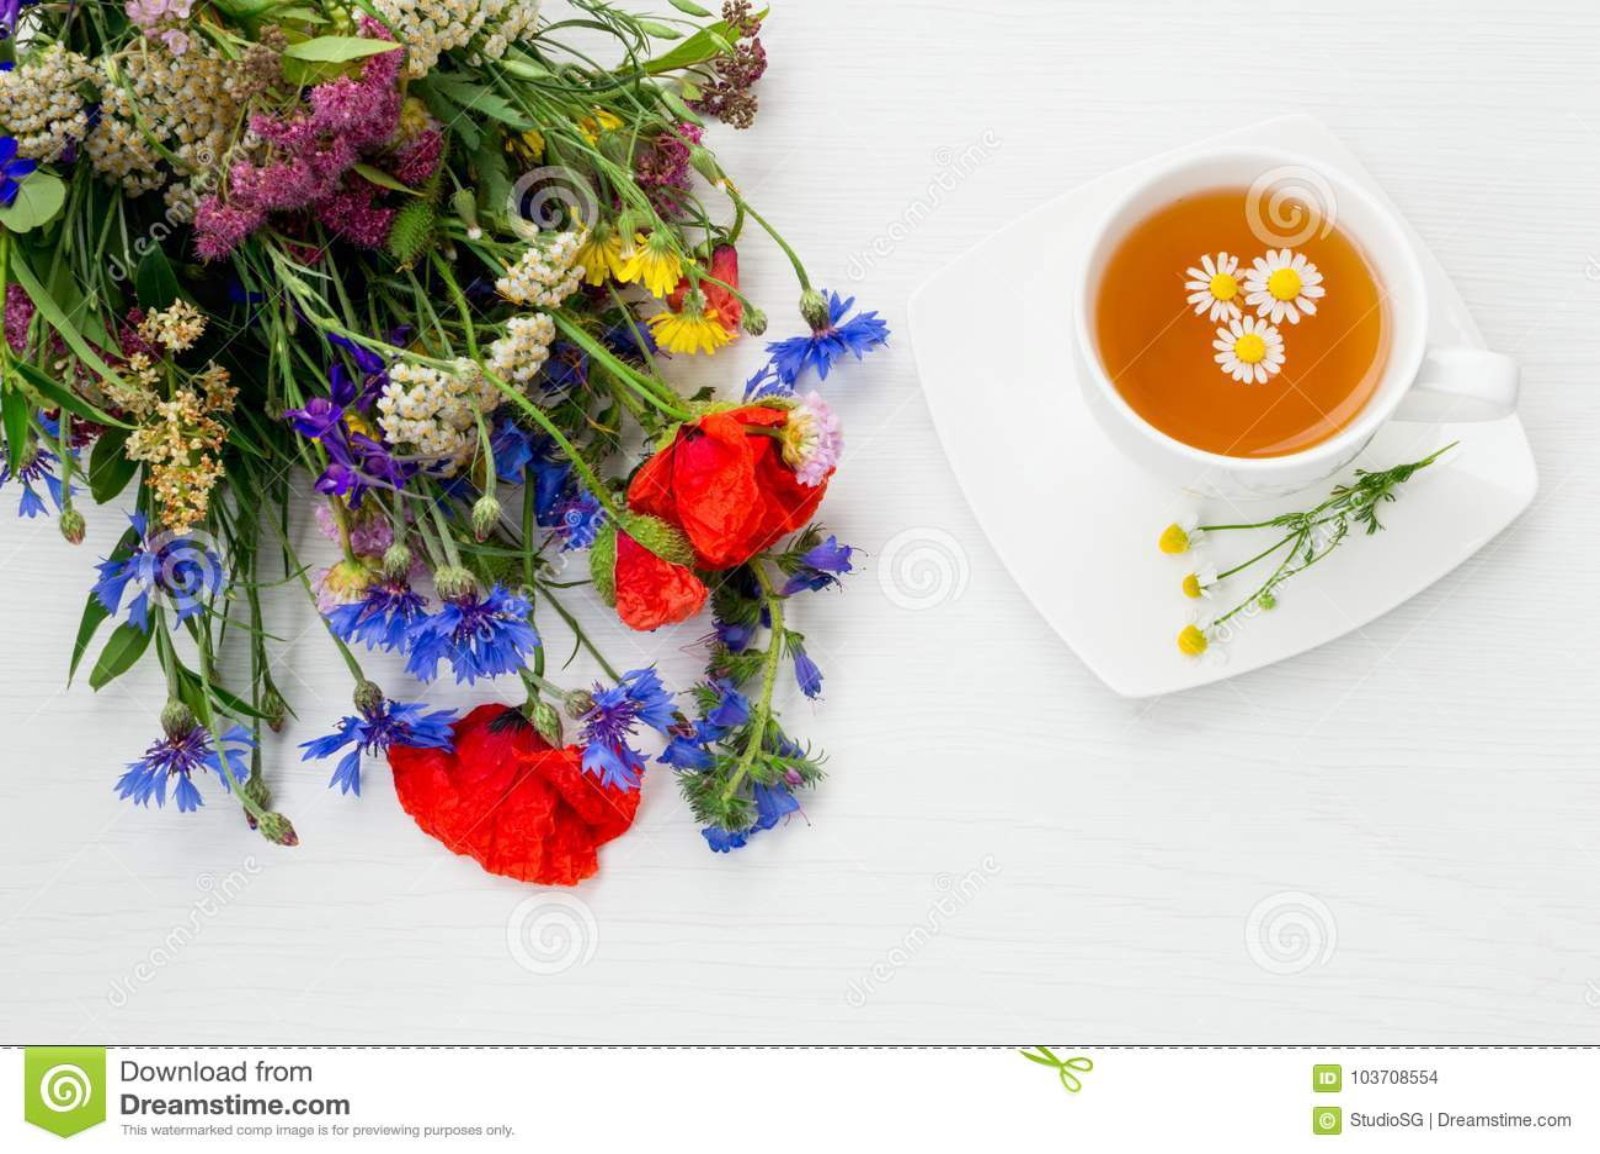 Chamomile Poppy Cornflower Yarrow And Other Beautiful Summer